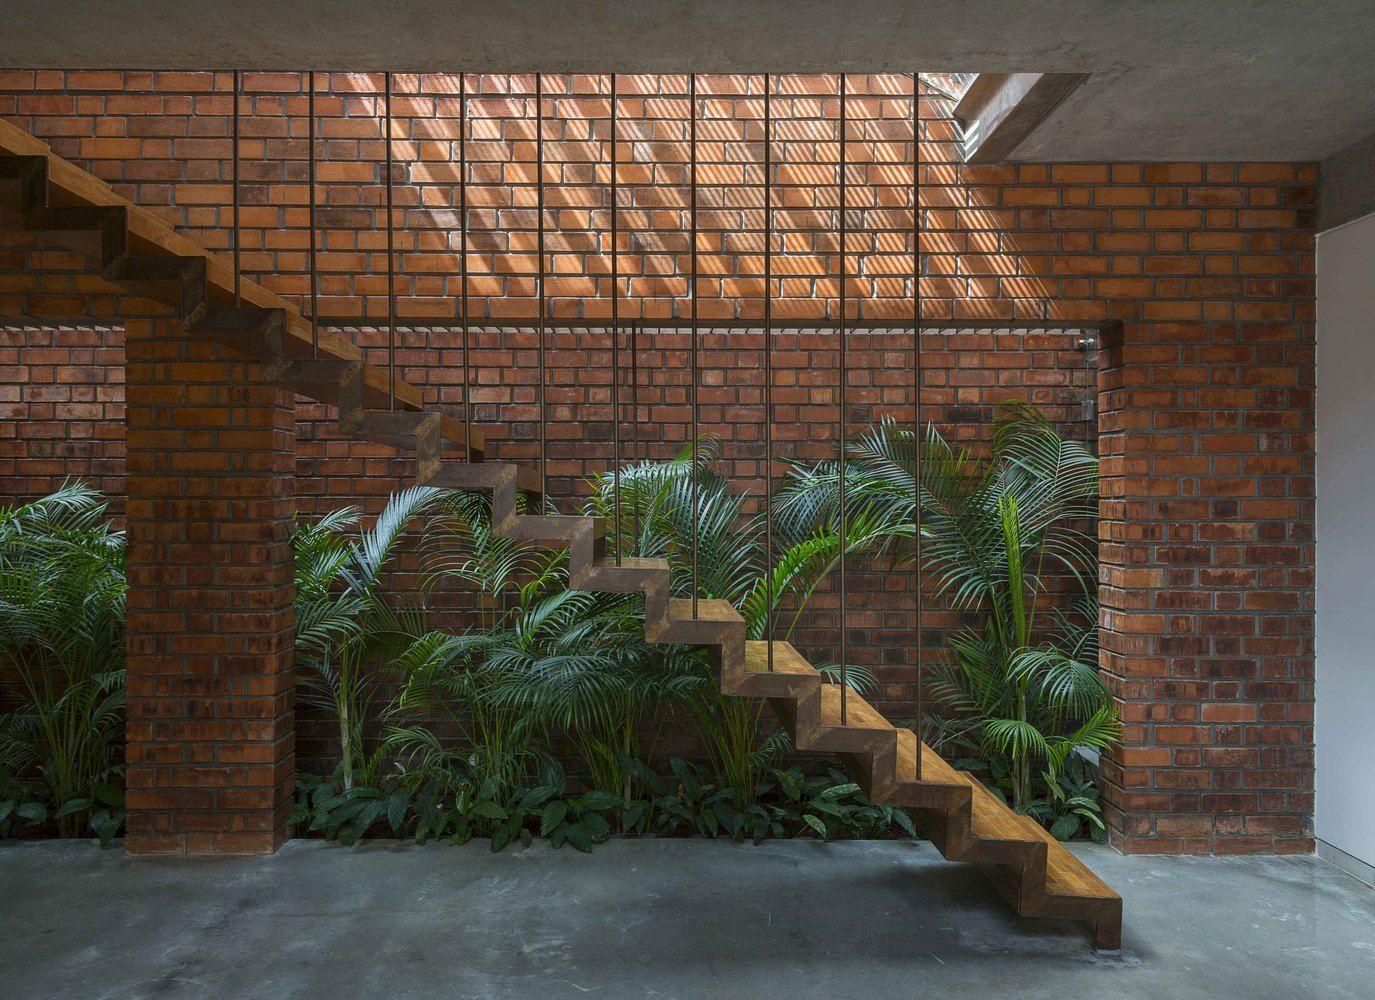 Galer a de casa de ladrillo architecture paradigm 2 en for Archi in casa moderna